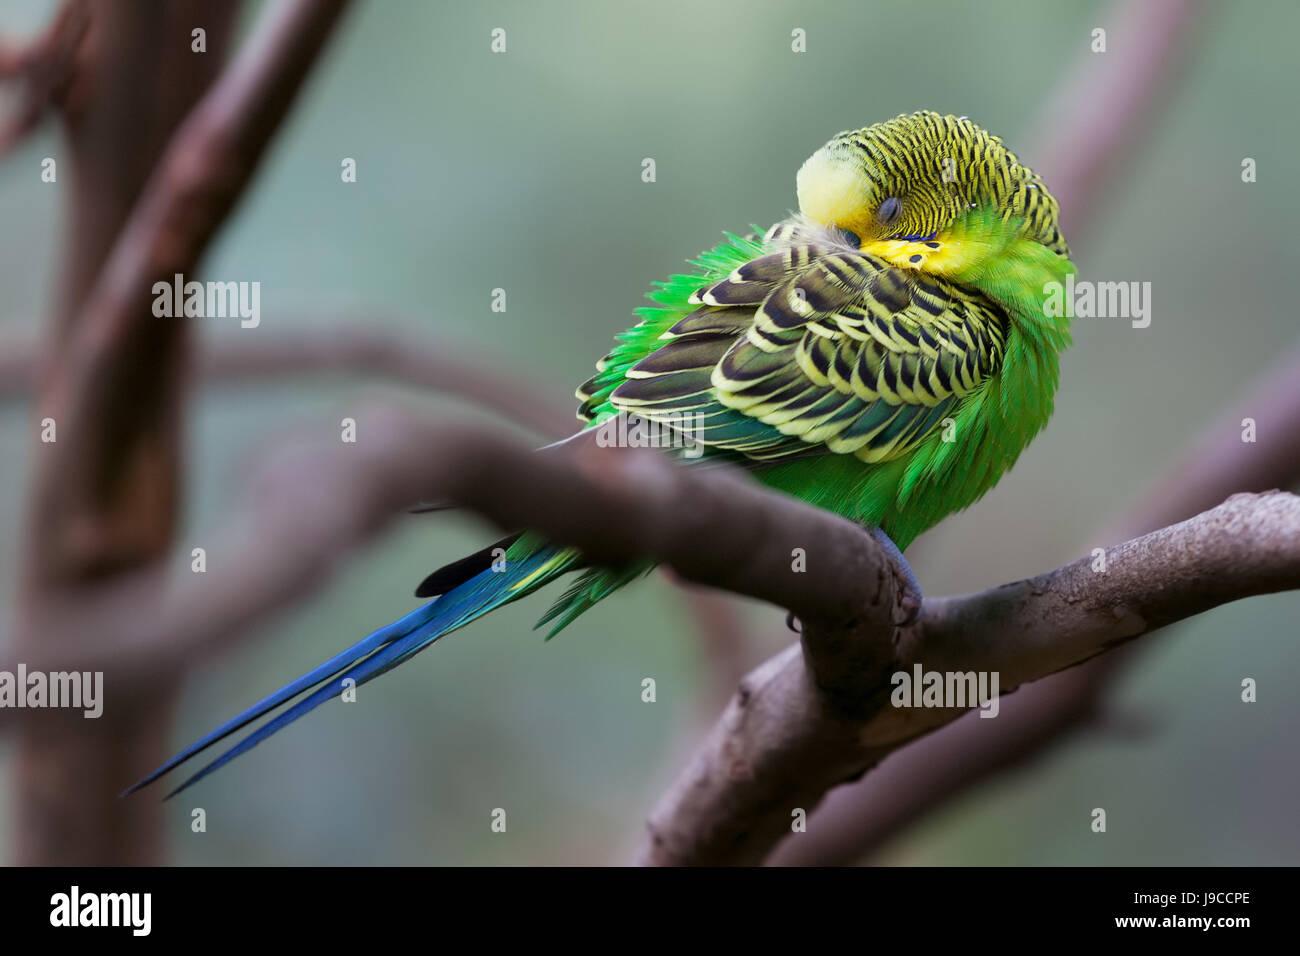 Budgerigar - song parrot perching and sleeping closeup - Stock Image